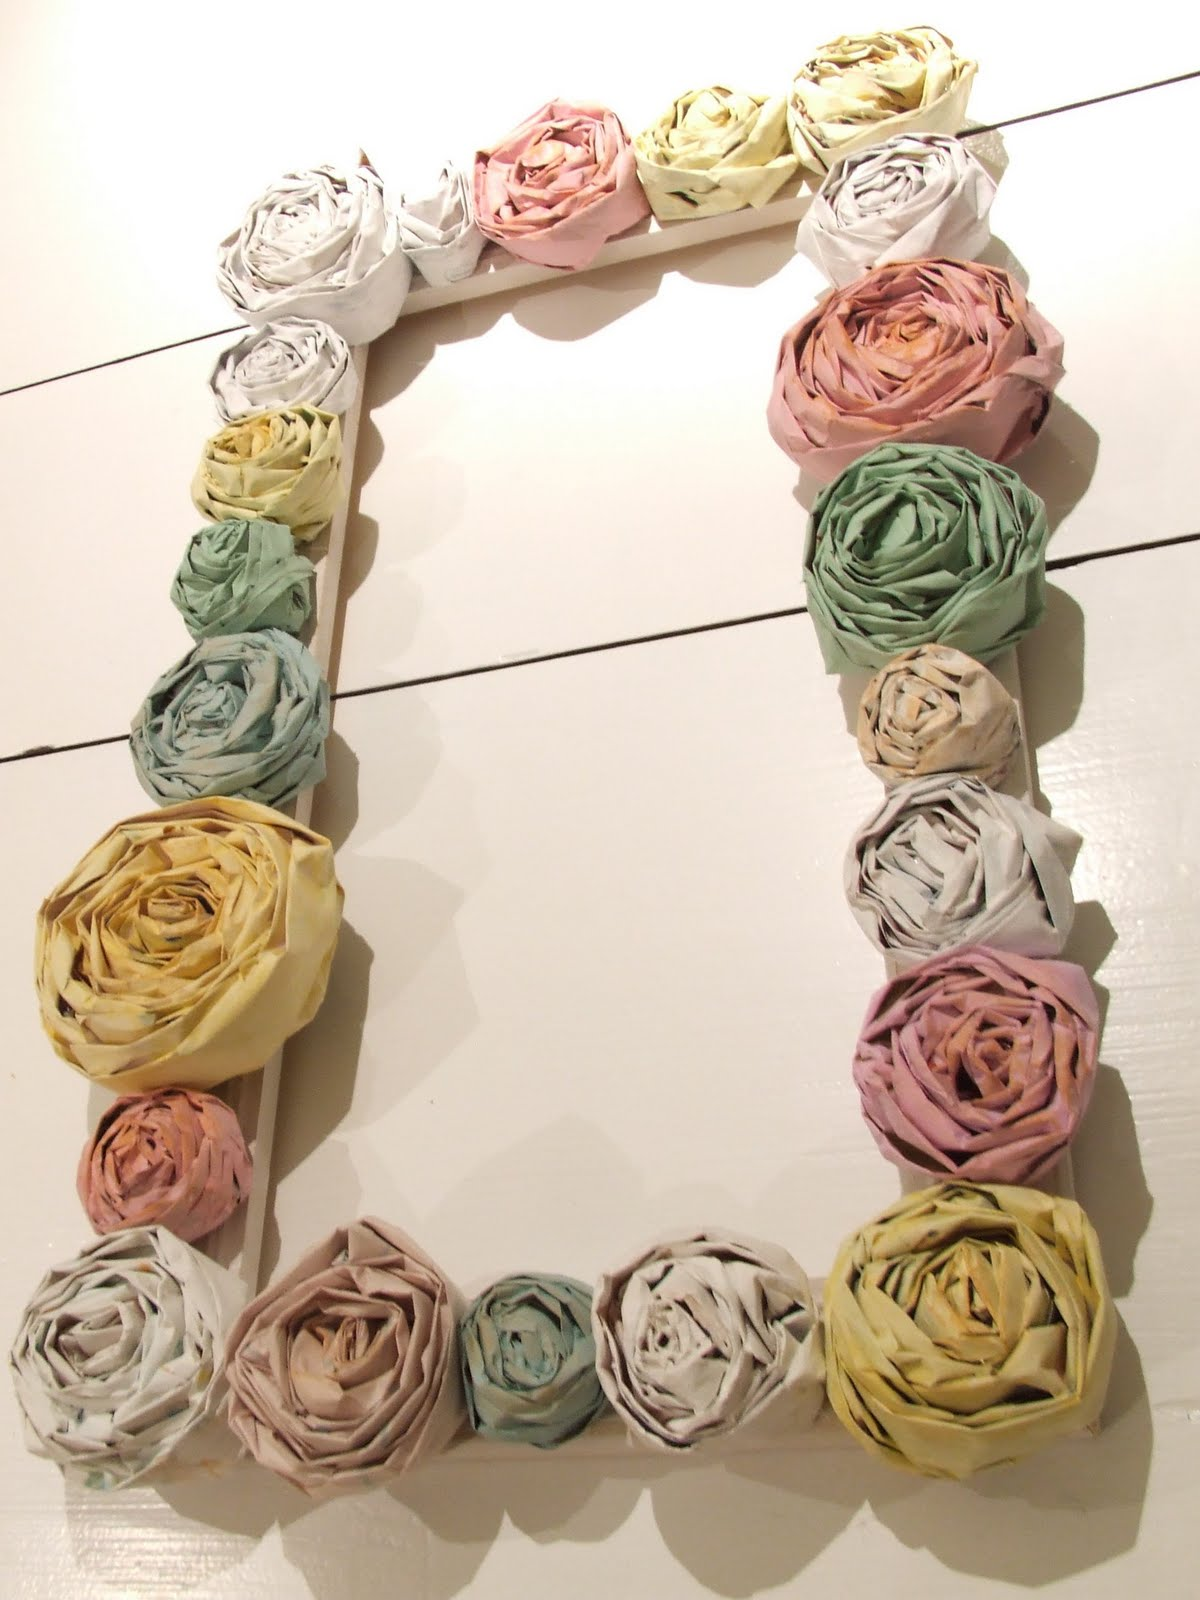 http://2.bp.blogspot.com/_O728Hix-VB0/S9eROzJ1HkI/AAAAAAAAAEo/xkGODvPf0DM/s1600/rose+wreath.jpg